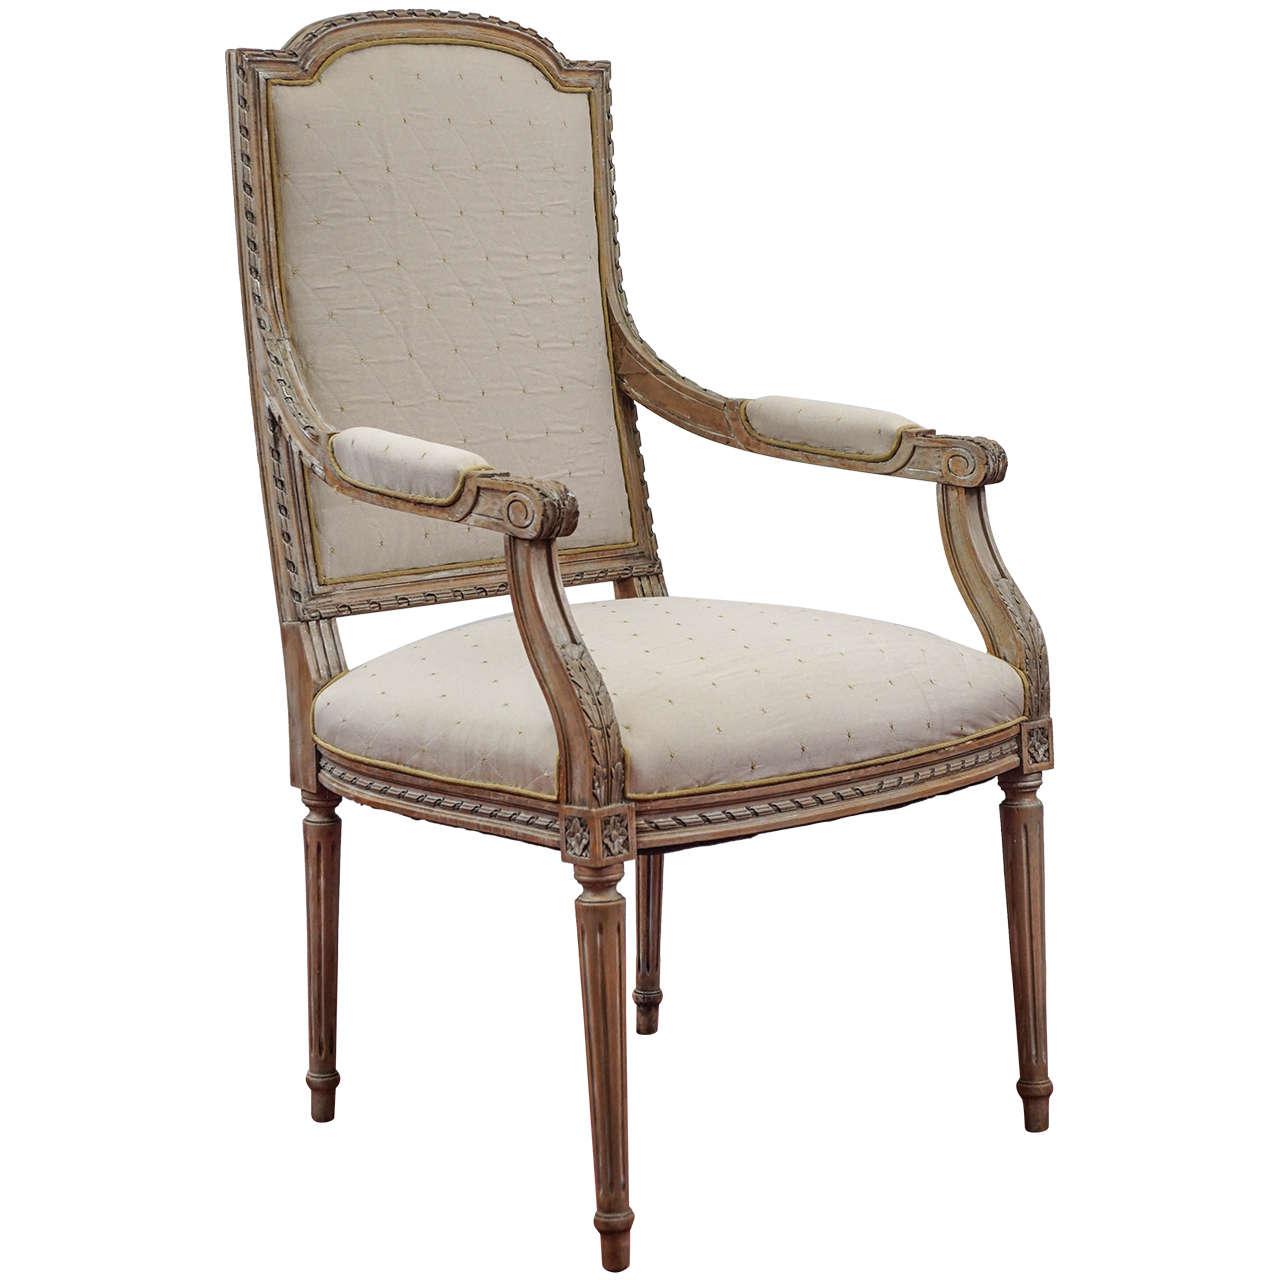 Done Louis XVI-Style Armchair